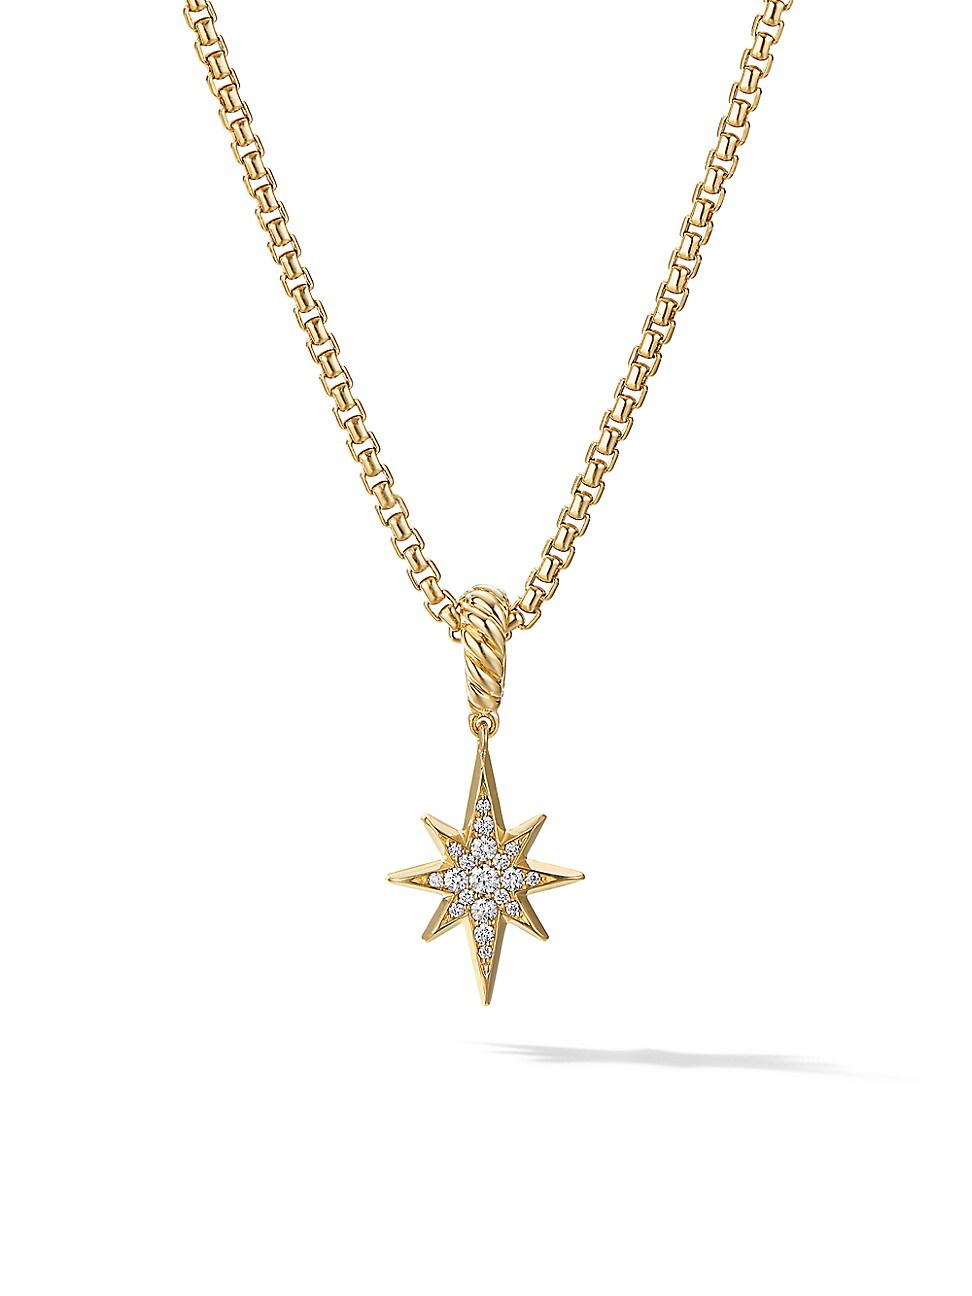 David Yurman Jewelrys WOMEN'S NORTH STAR AMULET IN 18K YELLOW GOLD WITH PAVÉ DIAMONDS